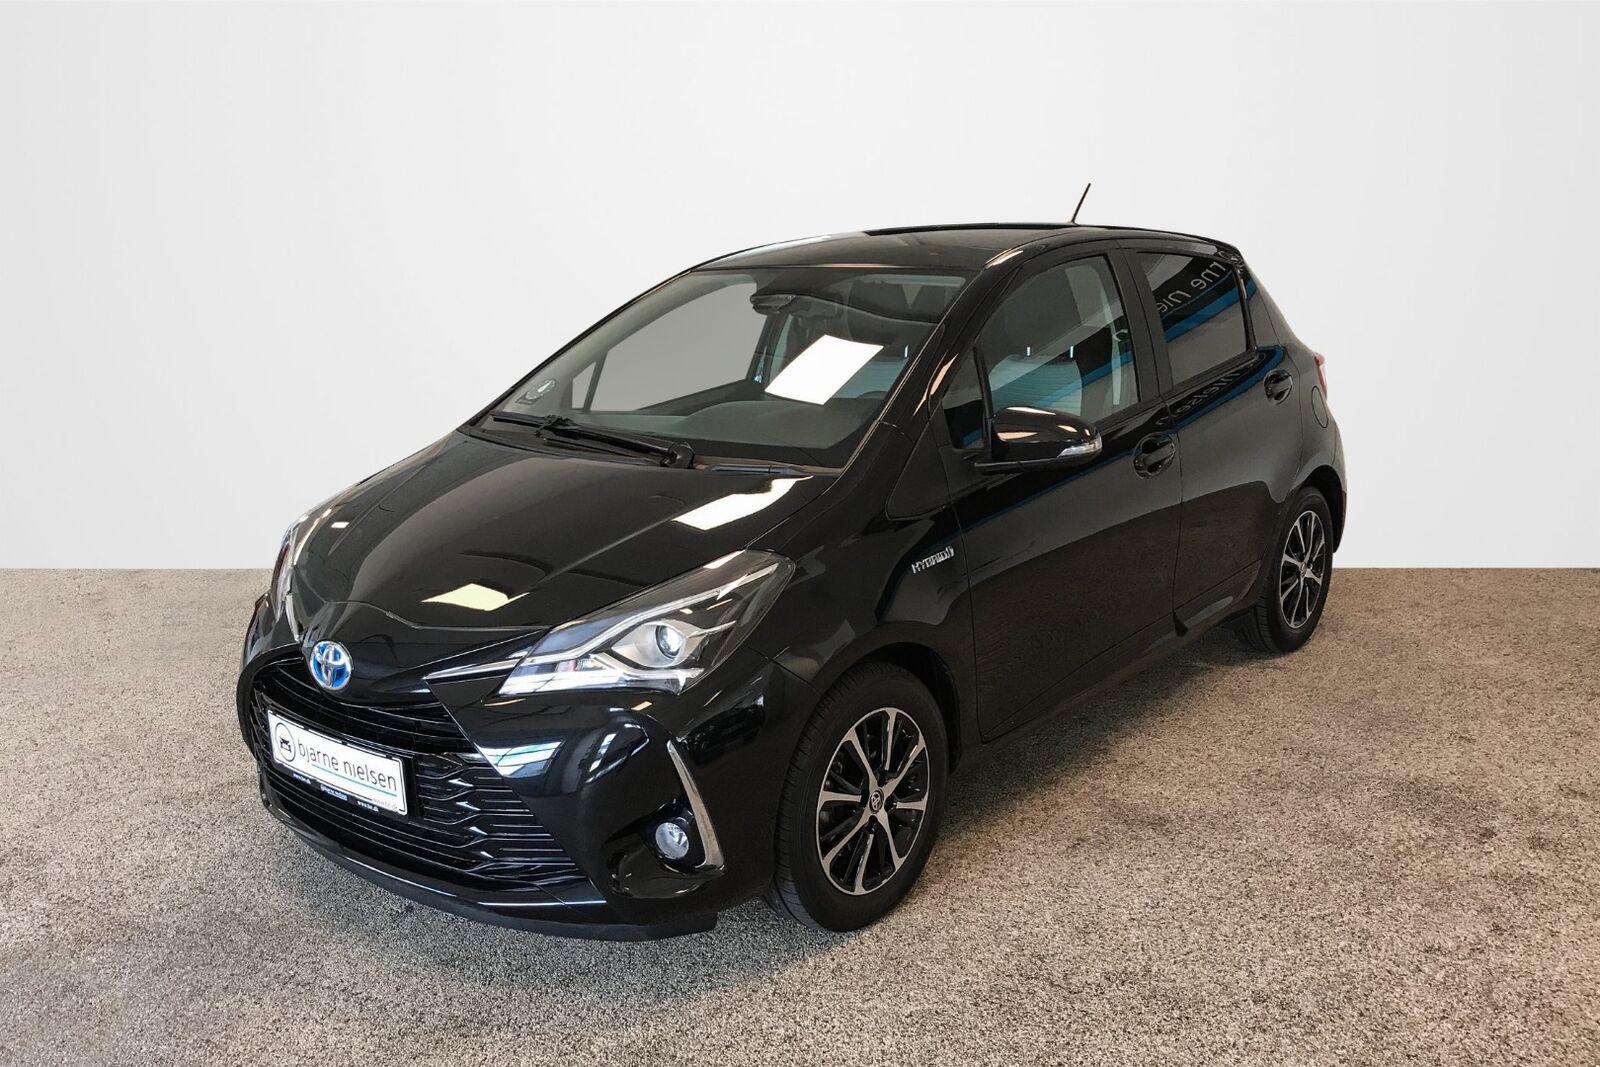 Toyota Yaris 1,5 Hybrid H3 Limited Smart e-CVT 5d - 164.700 kr.